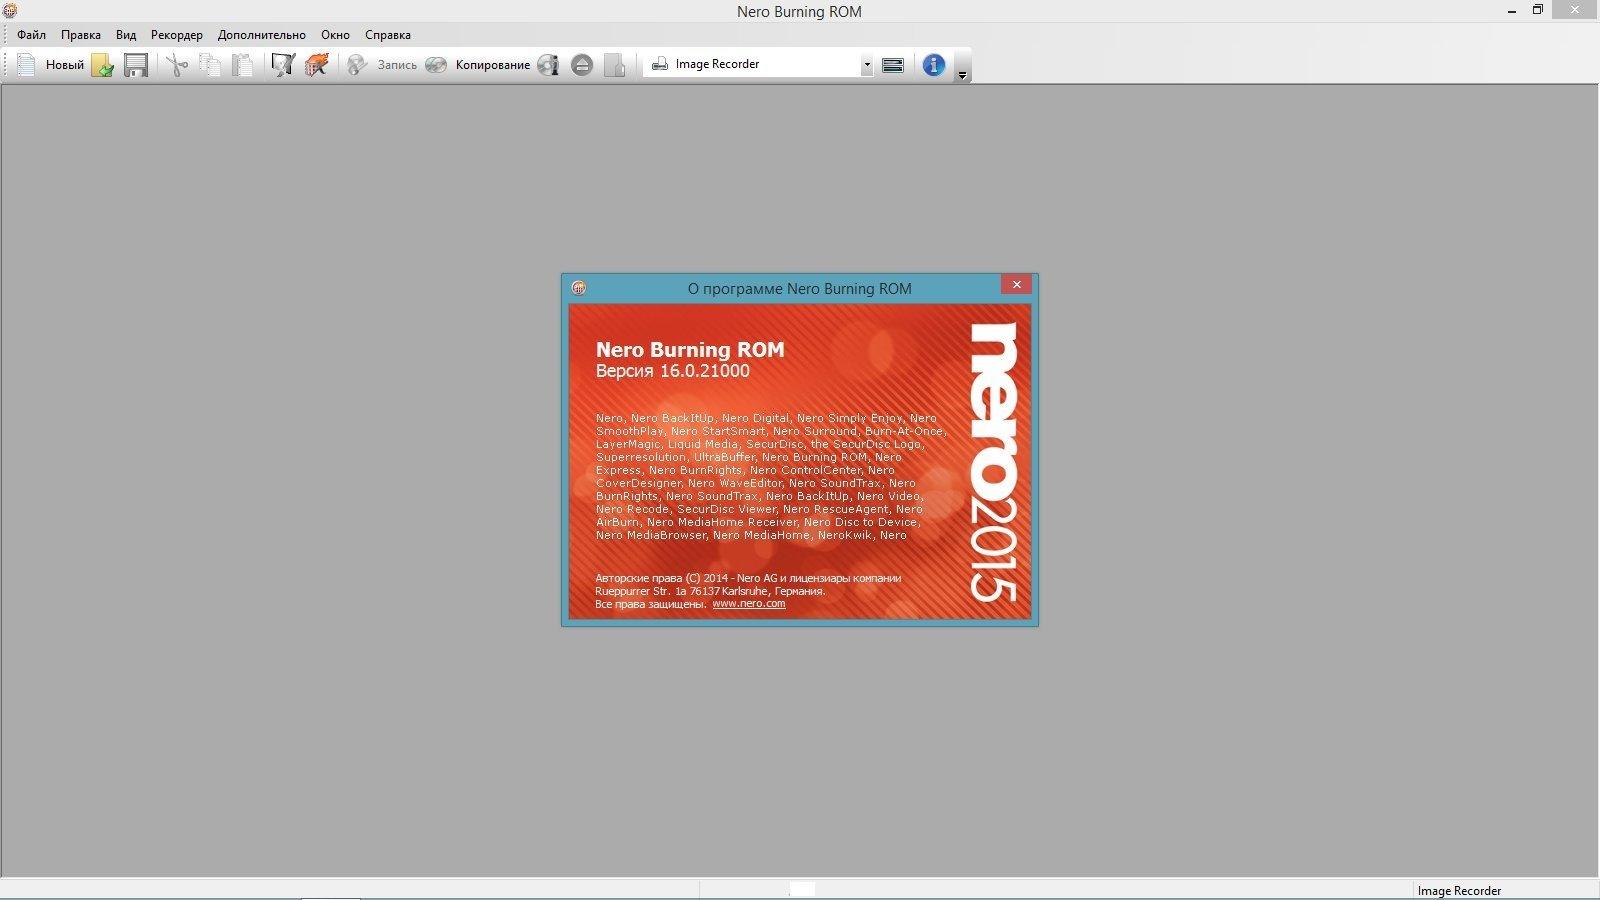 http://fs1.directupload.net/images/141212/gxyxr47r.jpg